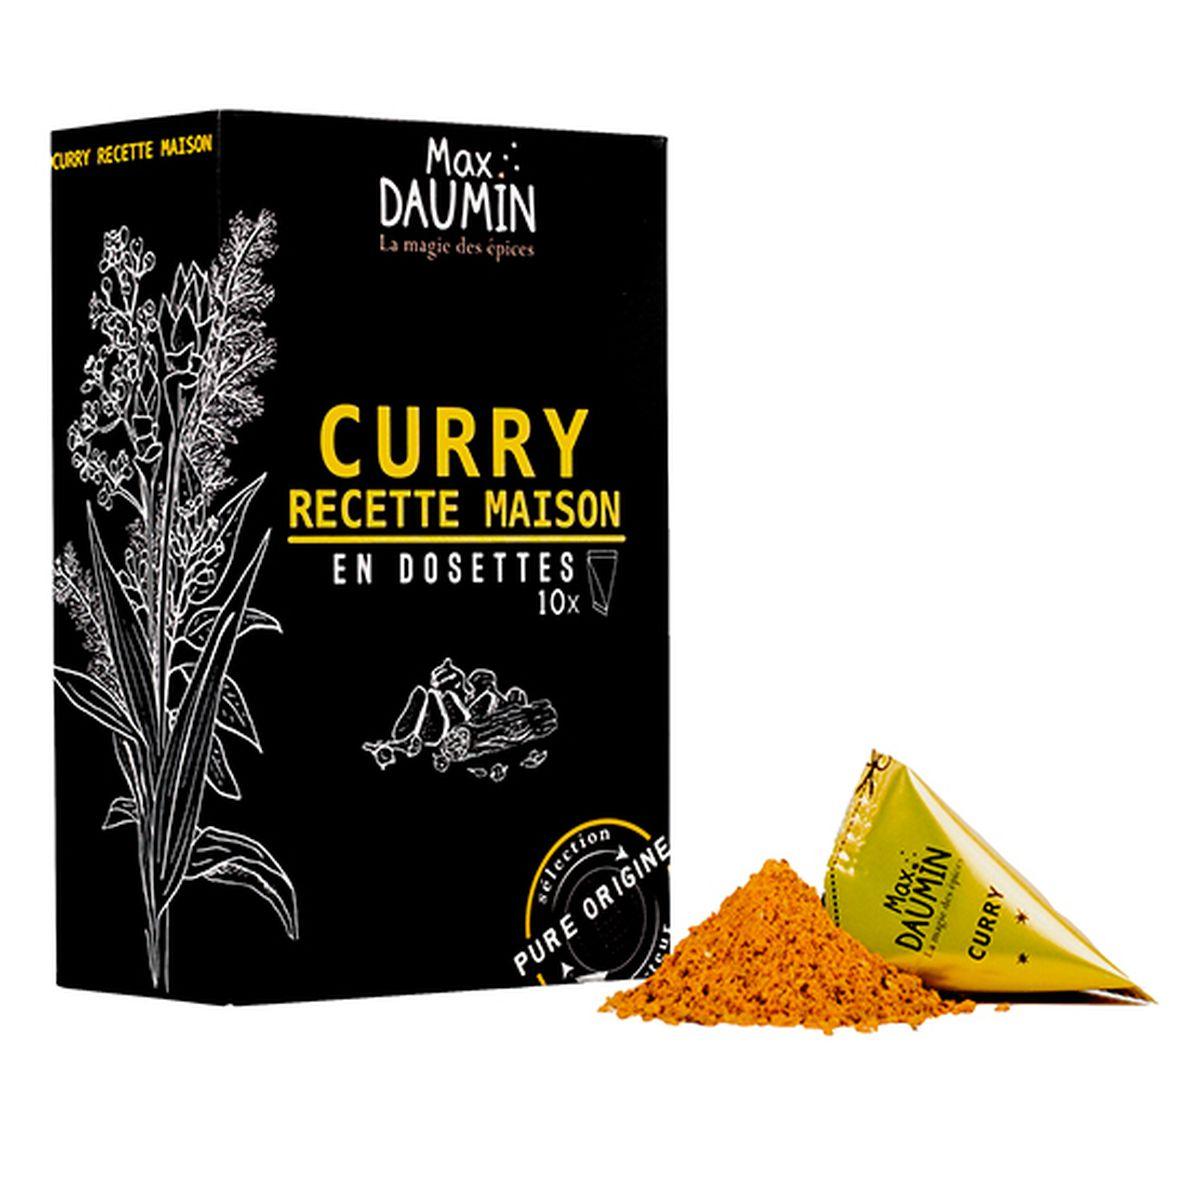 Curry recette maison - Max Daumin